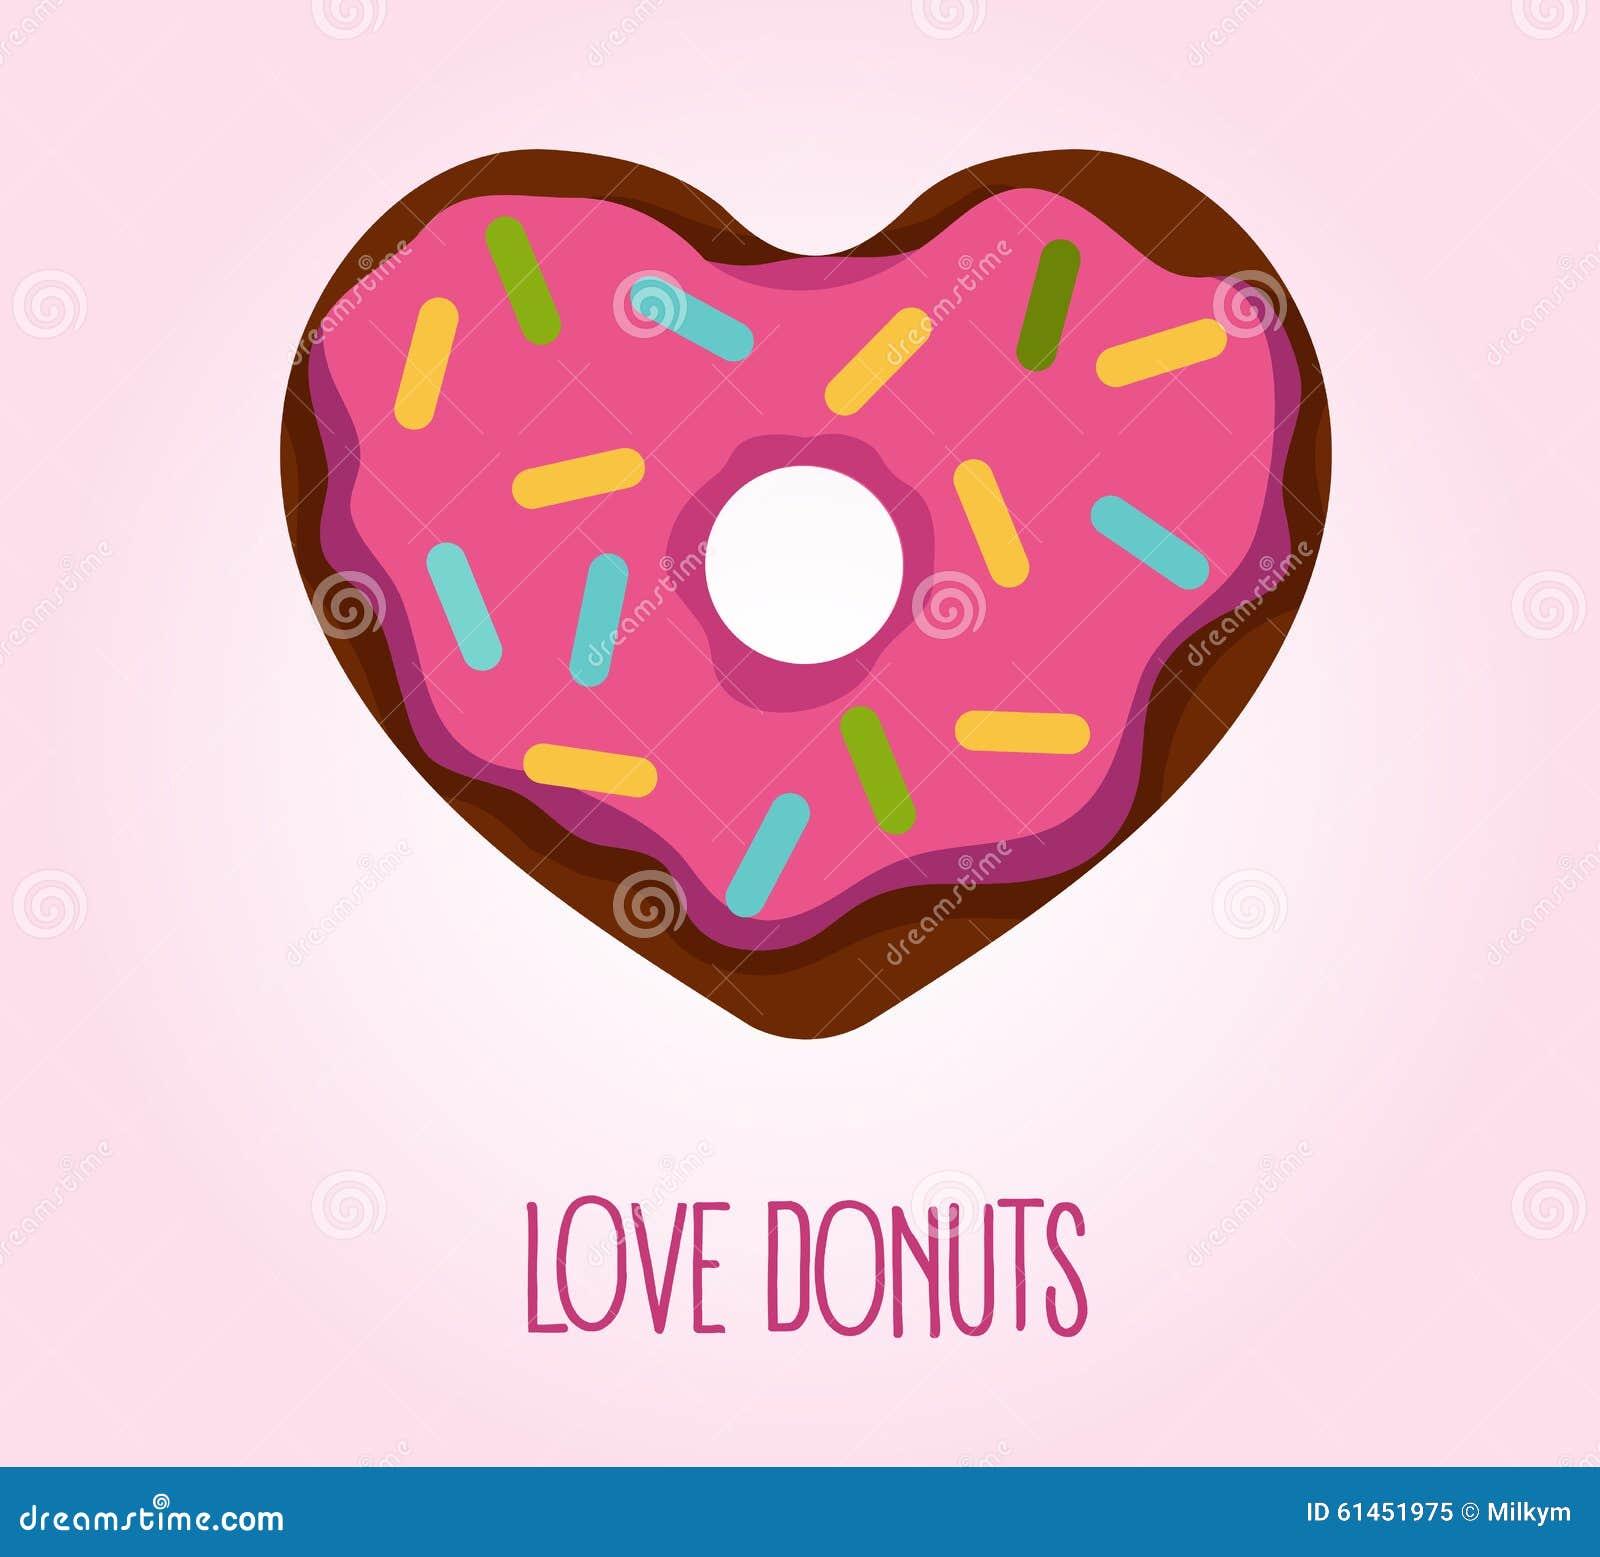 donut in heart shape stock vector image 61451975 heart shape vector free black and white heart shape vector free black and white